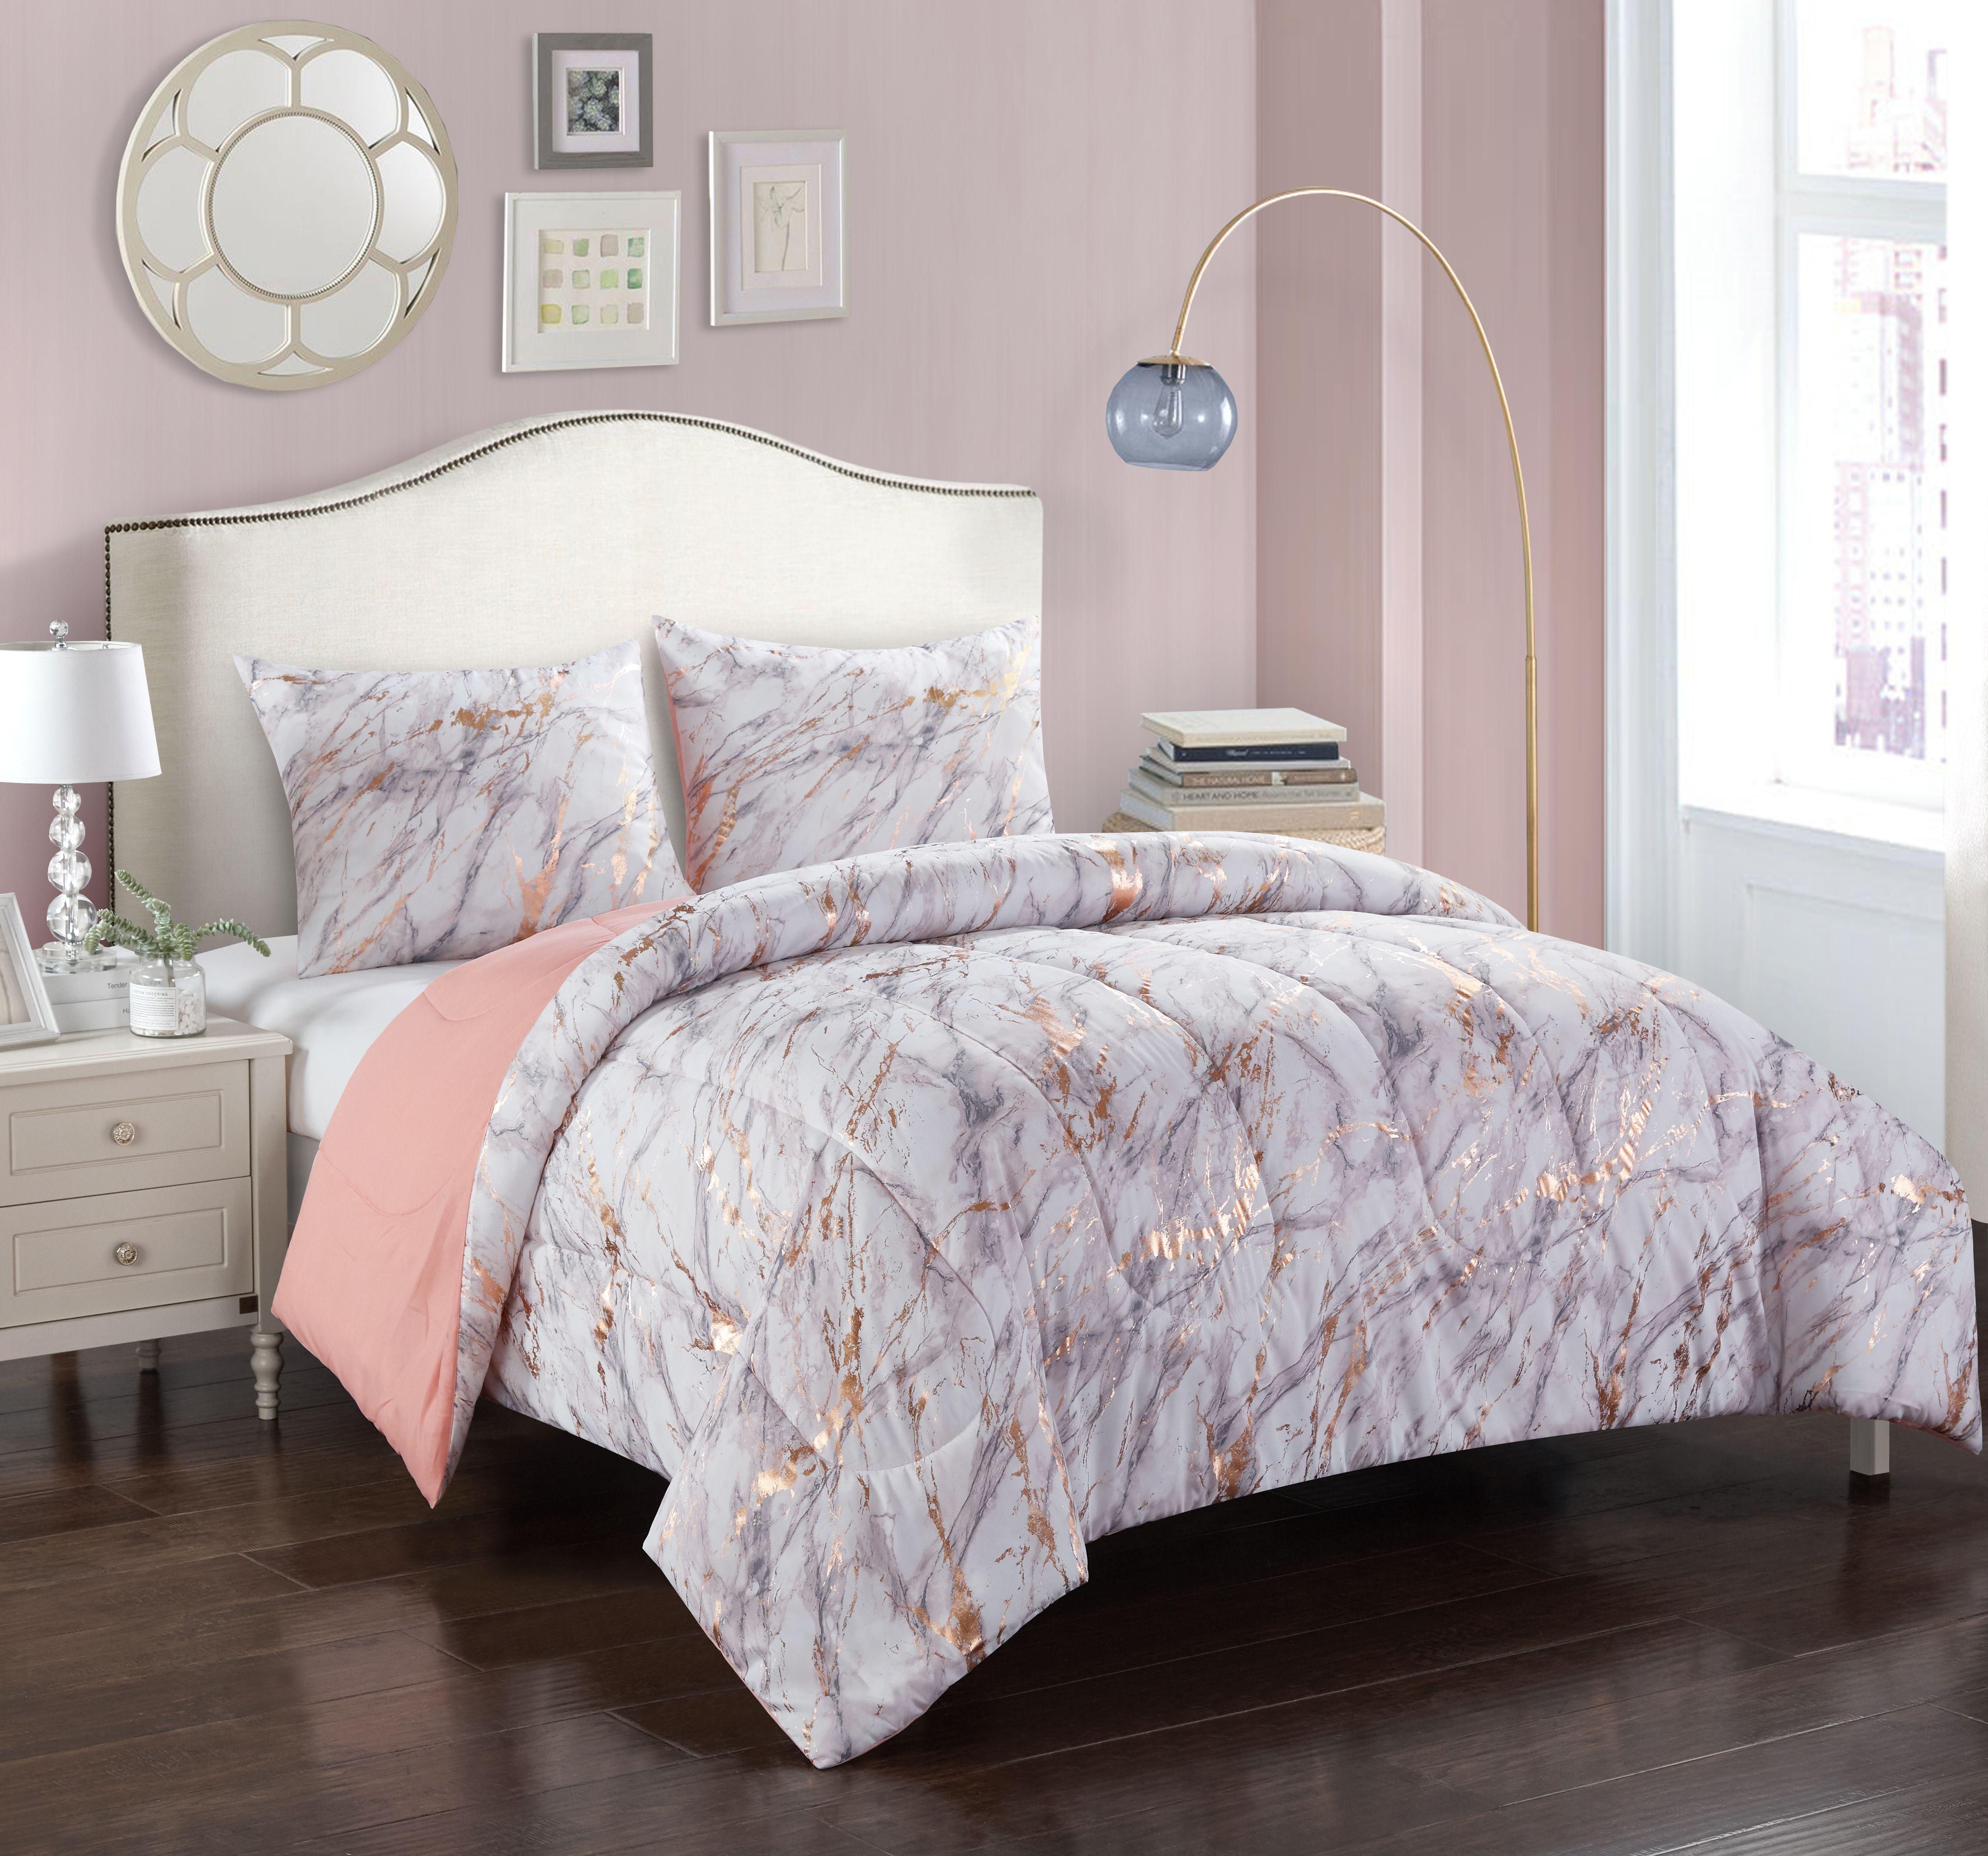 Your Zone Metallic Marble Comforter Set Walmart Com In 2020 Rose Gold Bedroom Decor Rose Gold Bedroom Gold Bedroom Decor